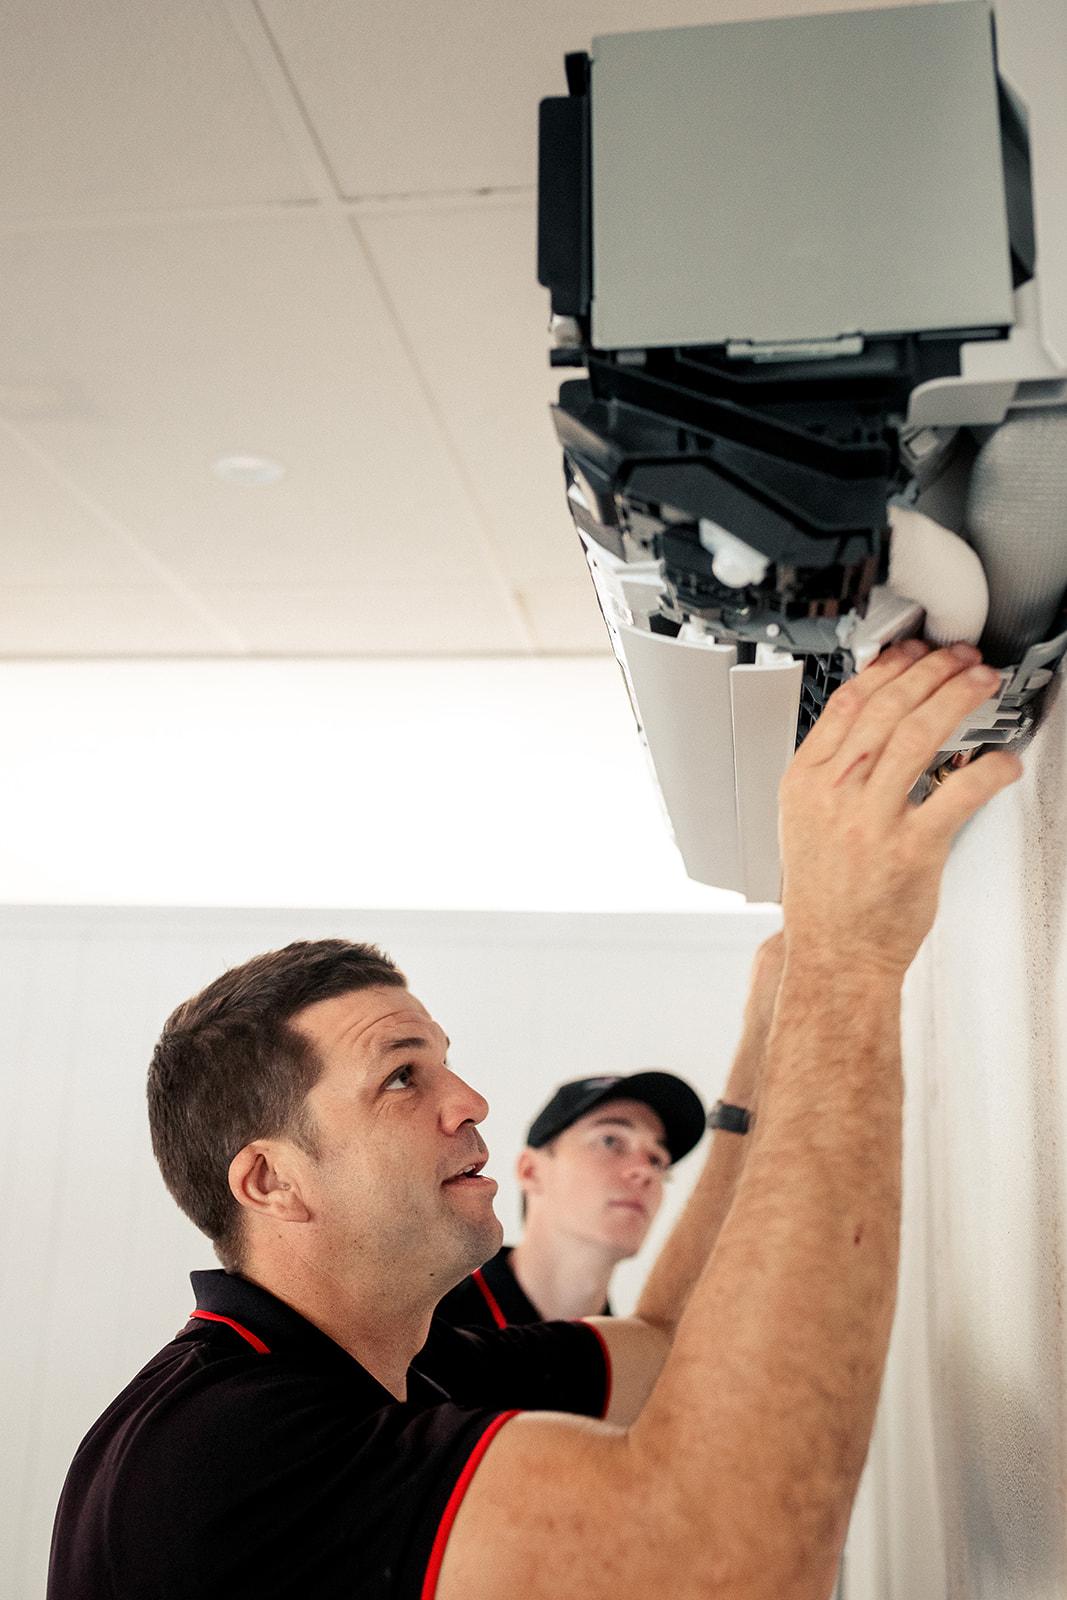 BP Air Services Installation bpairservices.com.au